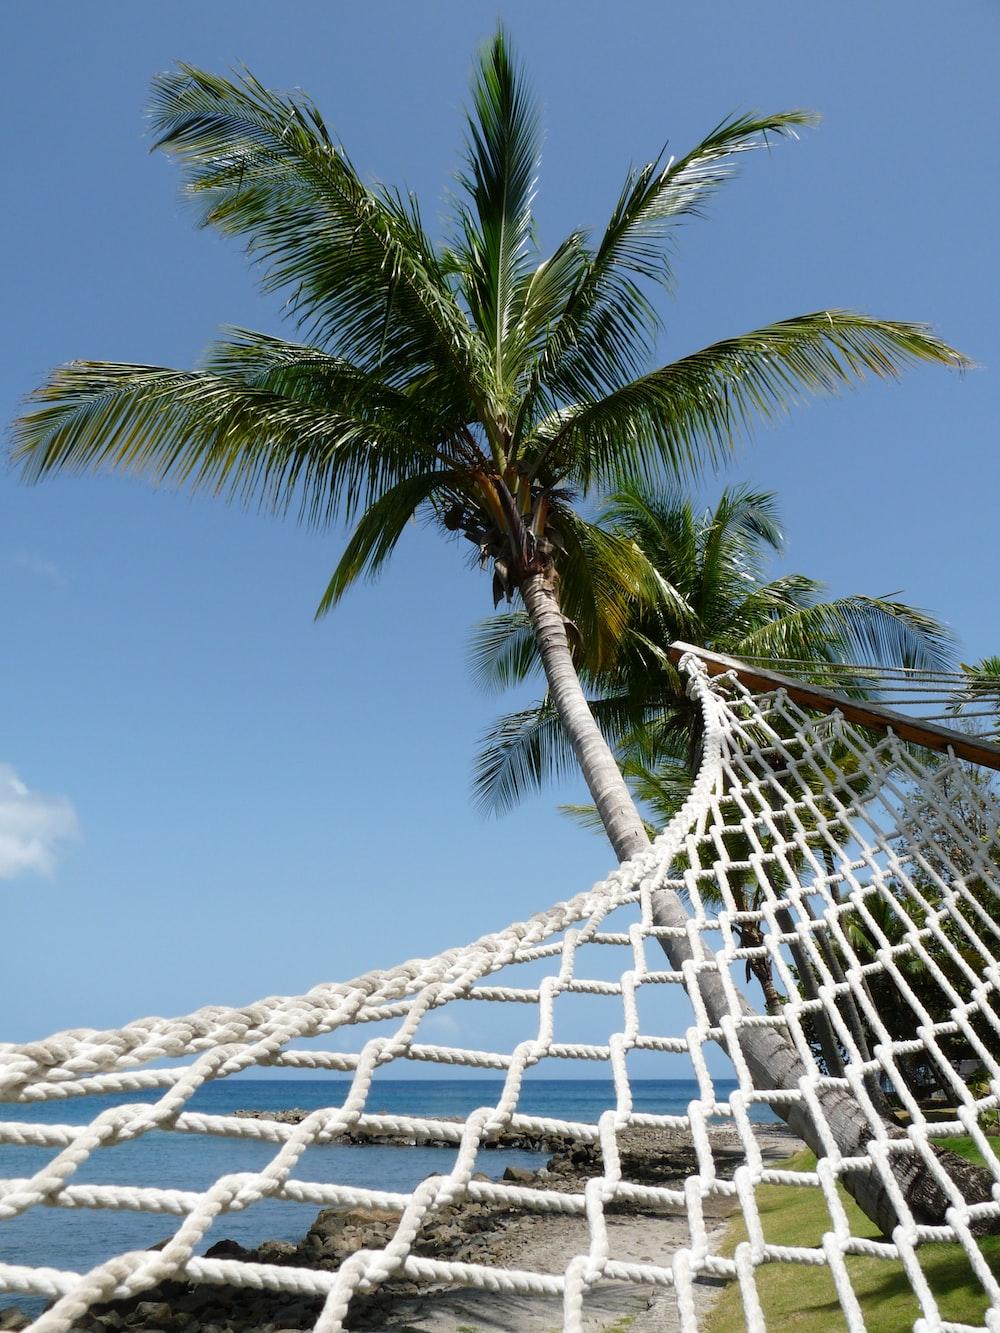 scenery of a hammock on a green palm tree